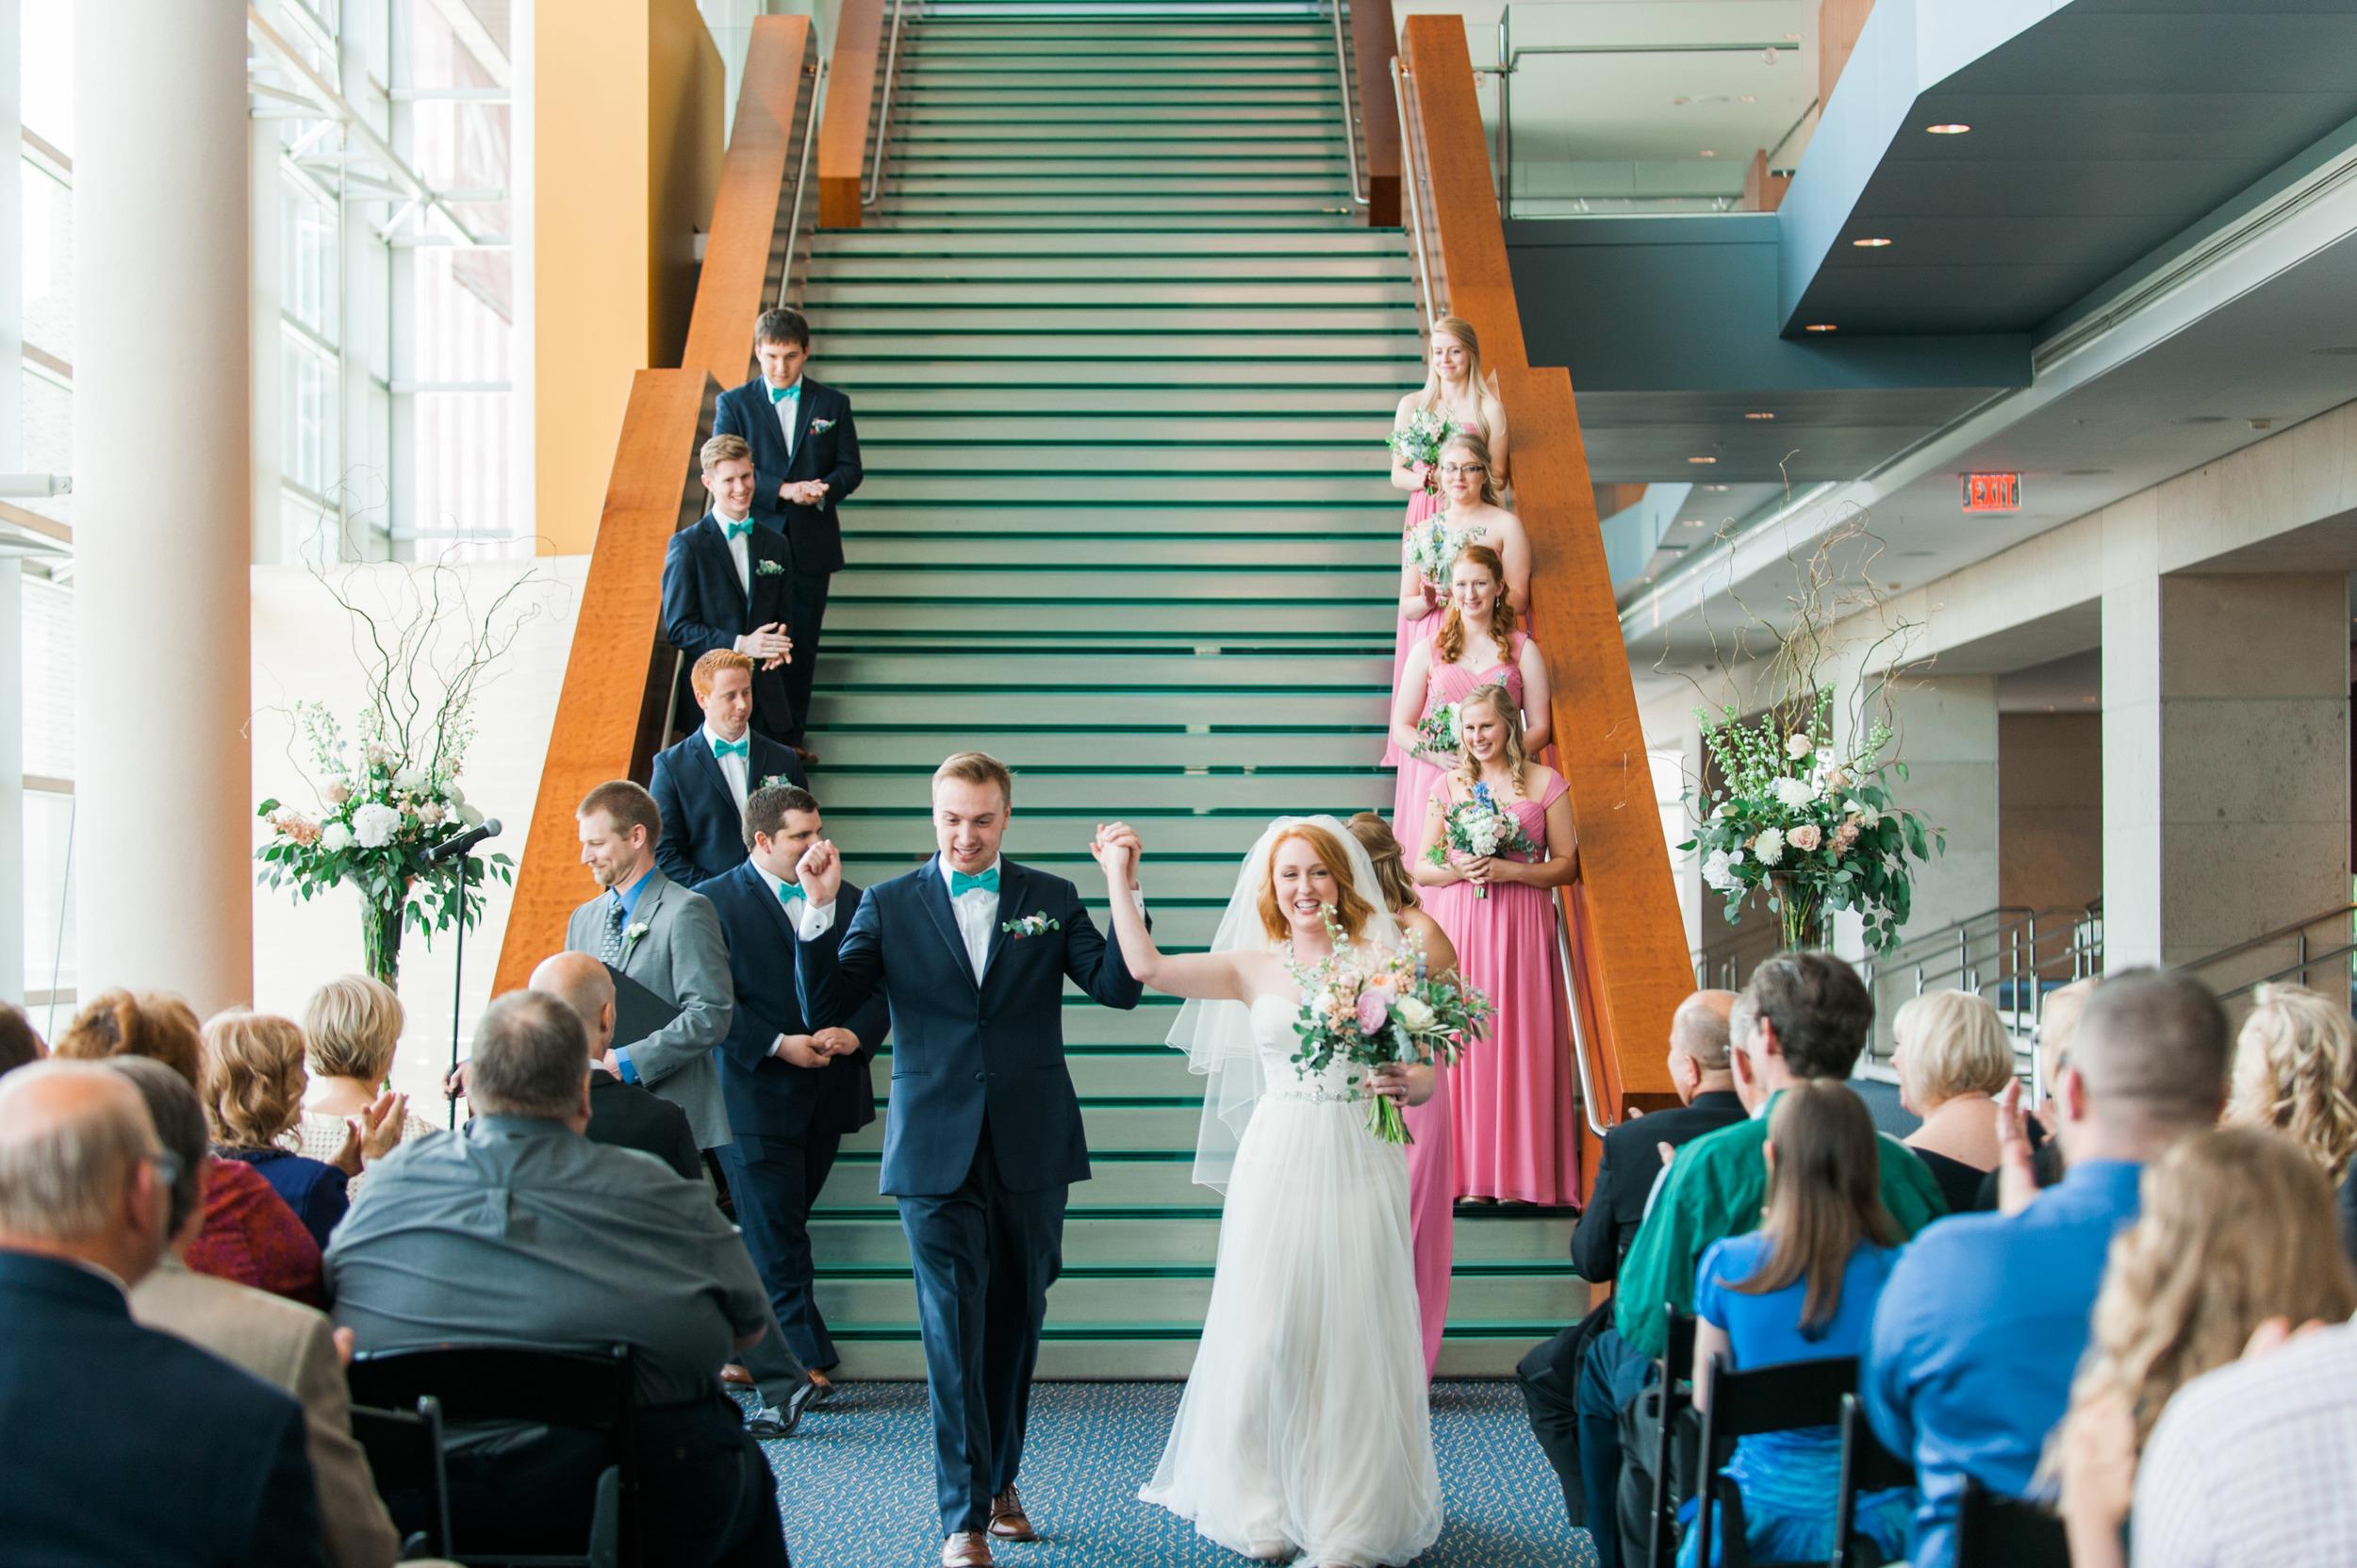 omaha-holland-arts-center-wedding-53.jpg